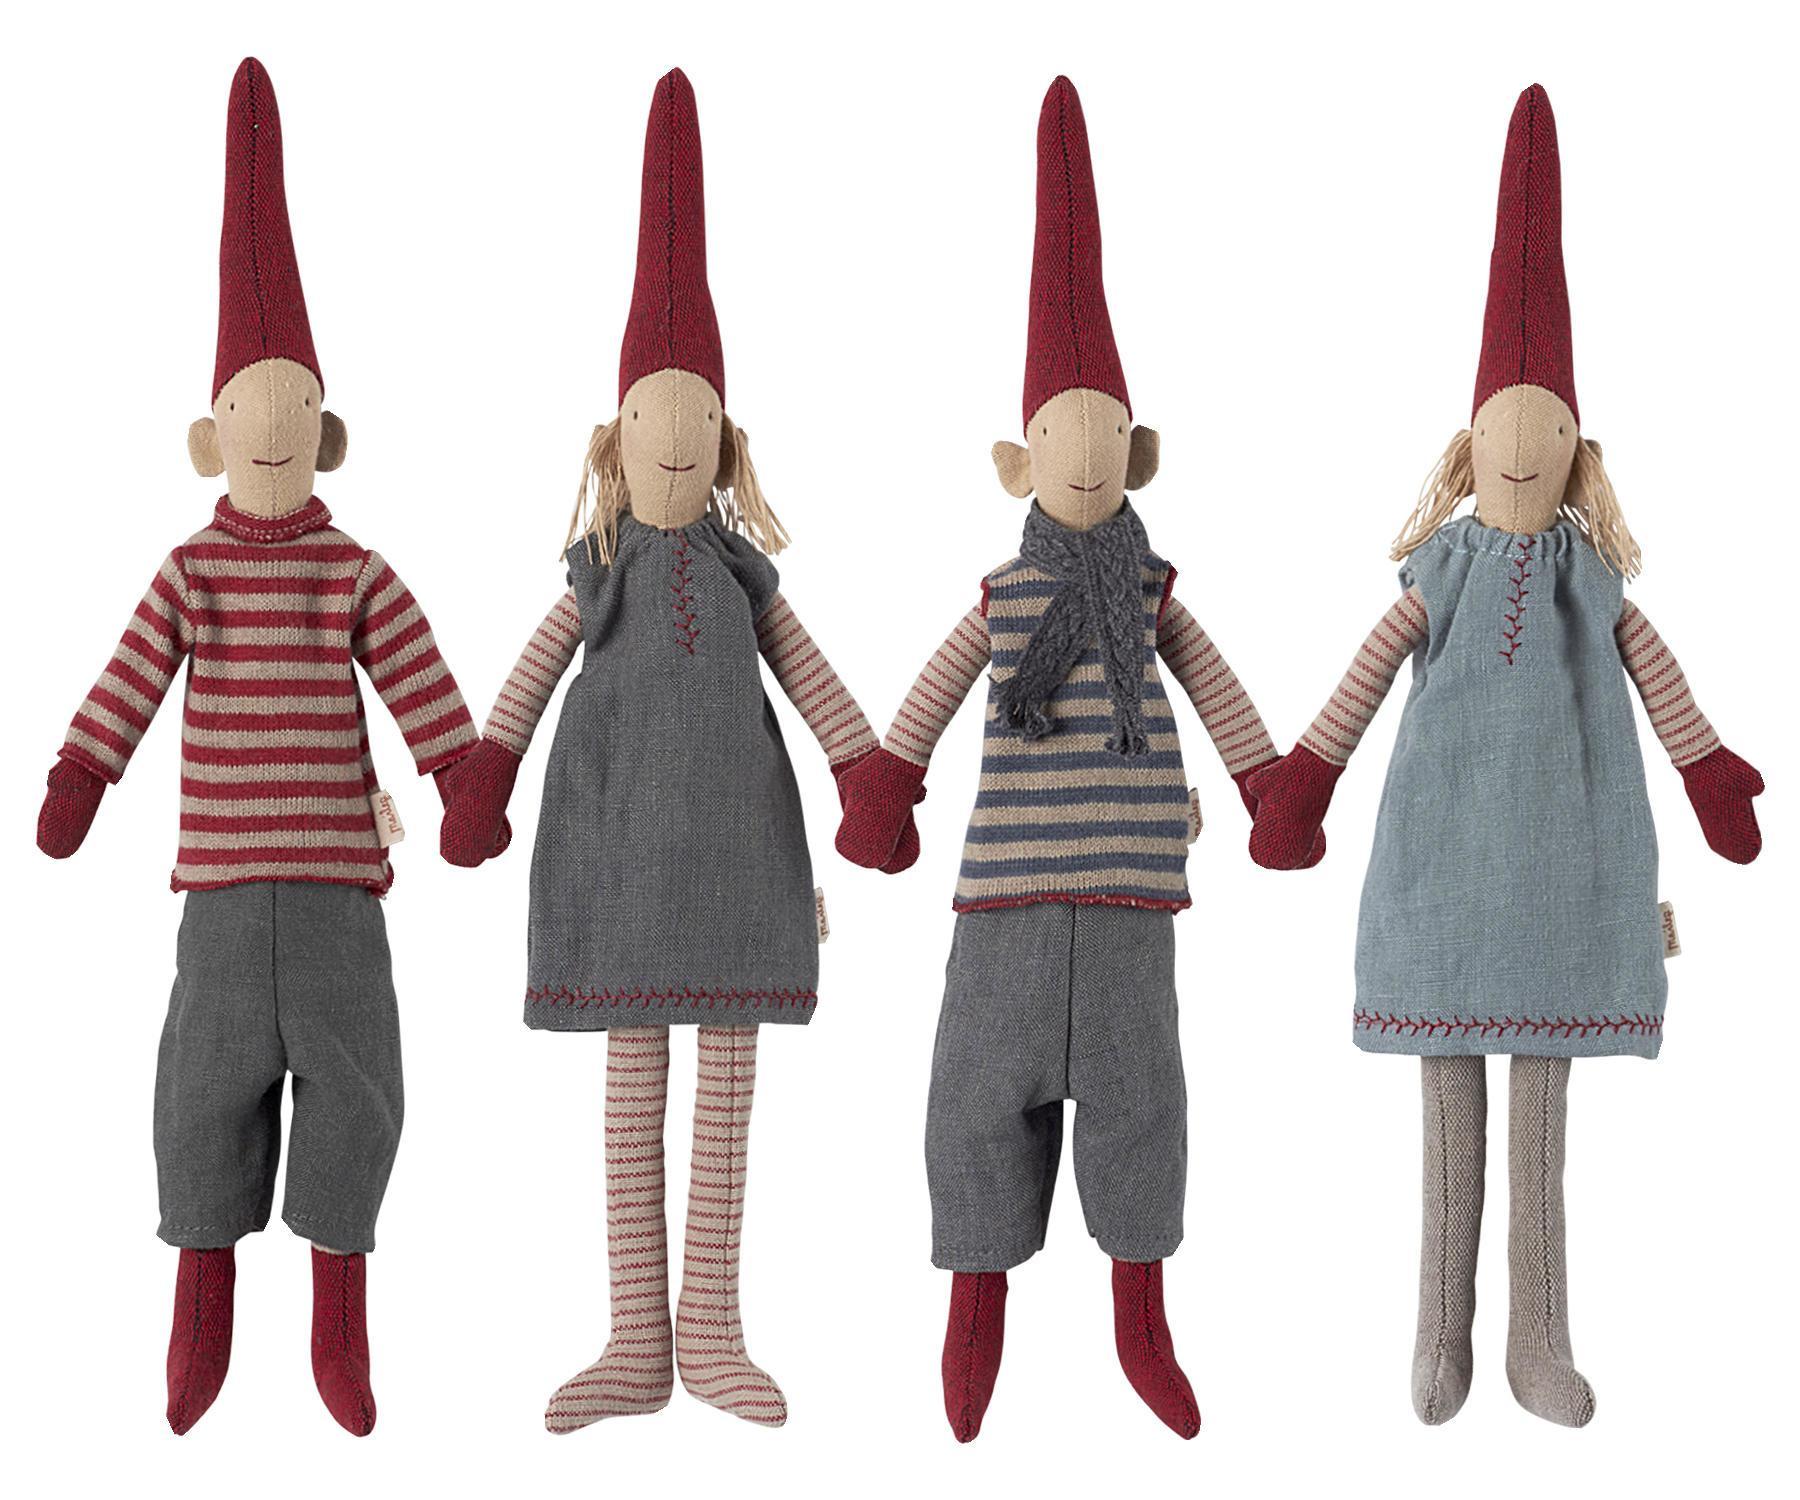 Maileg Skřítek Pixy čtyři varianty - mini Typ A (kluk svetr), červená barva, béžová barva, šedá barva, textil